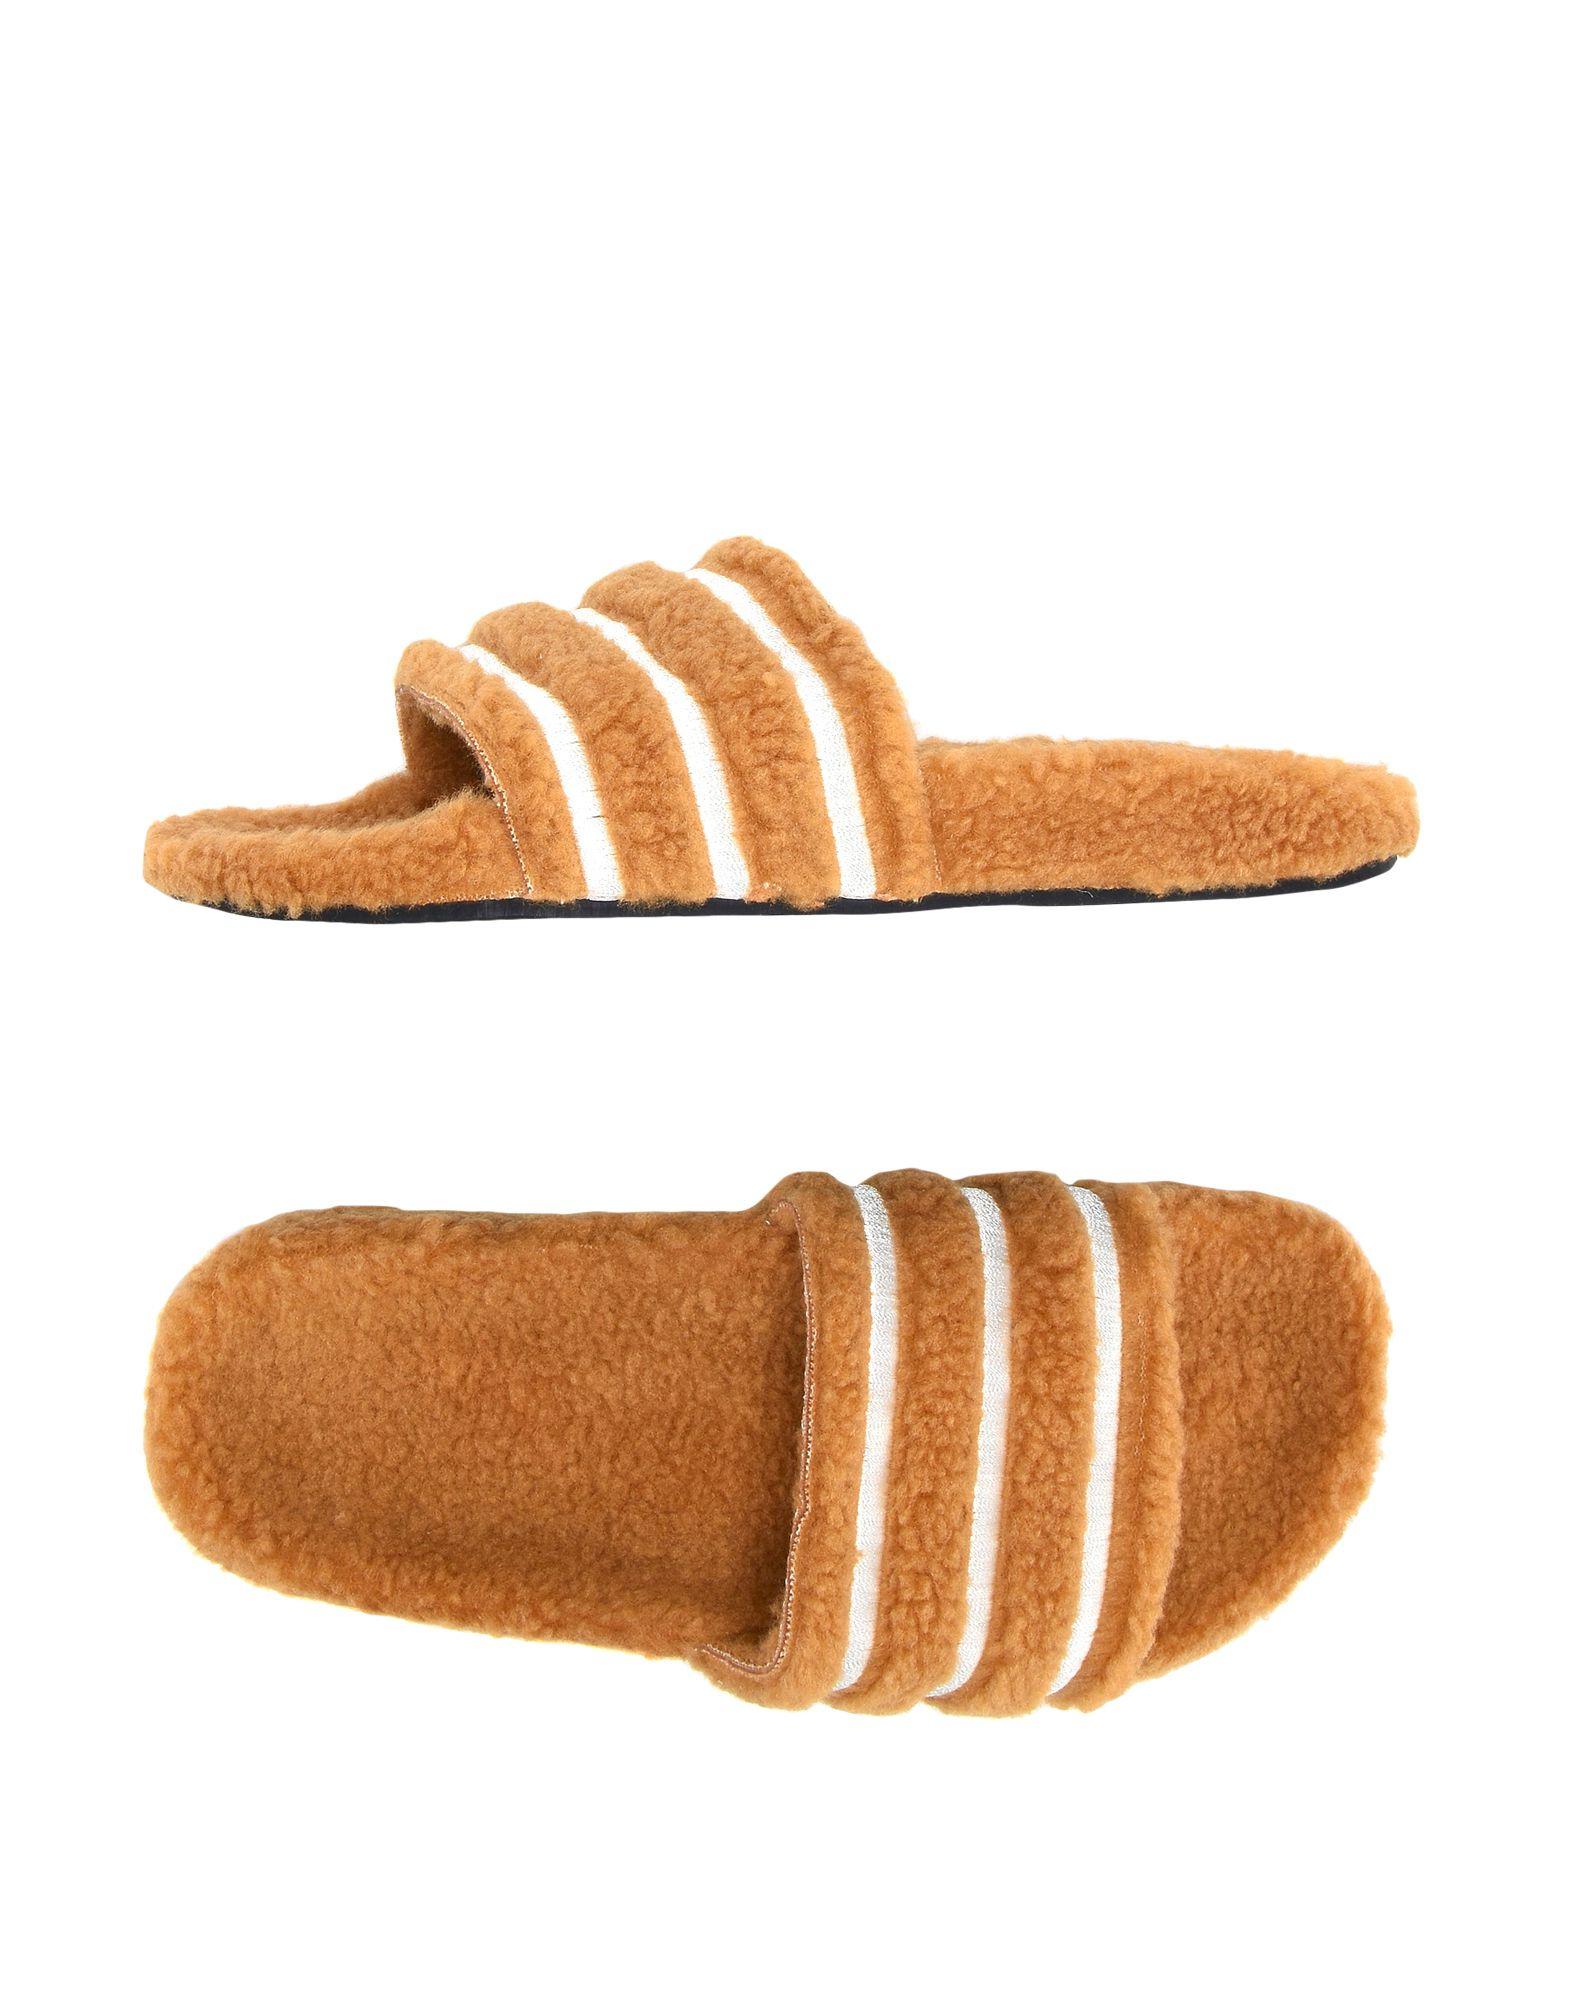 Sandali Adidas Originals Adilette W - Donna - Acquista online su YOOX -  11440186IU